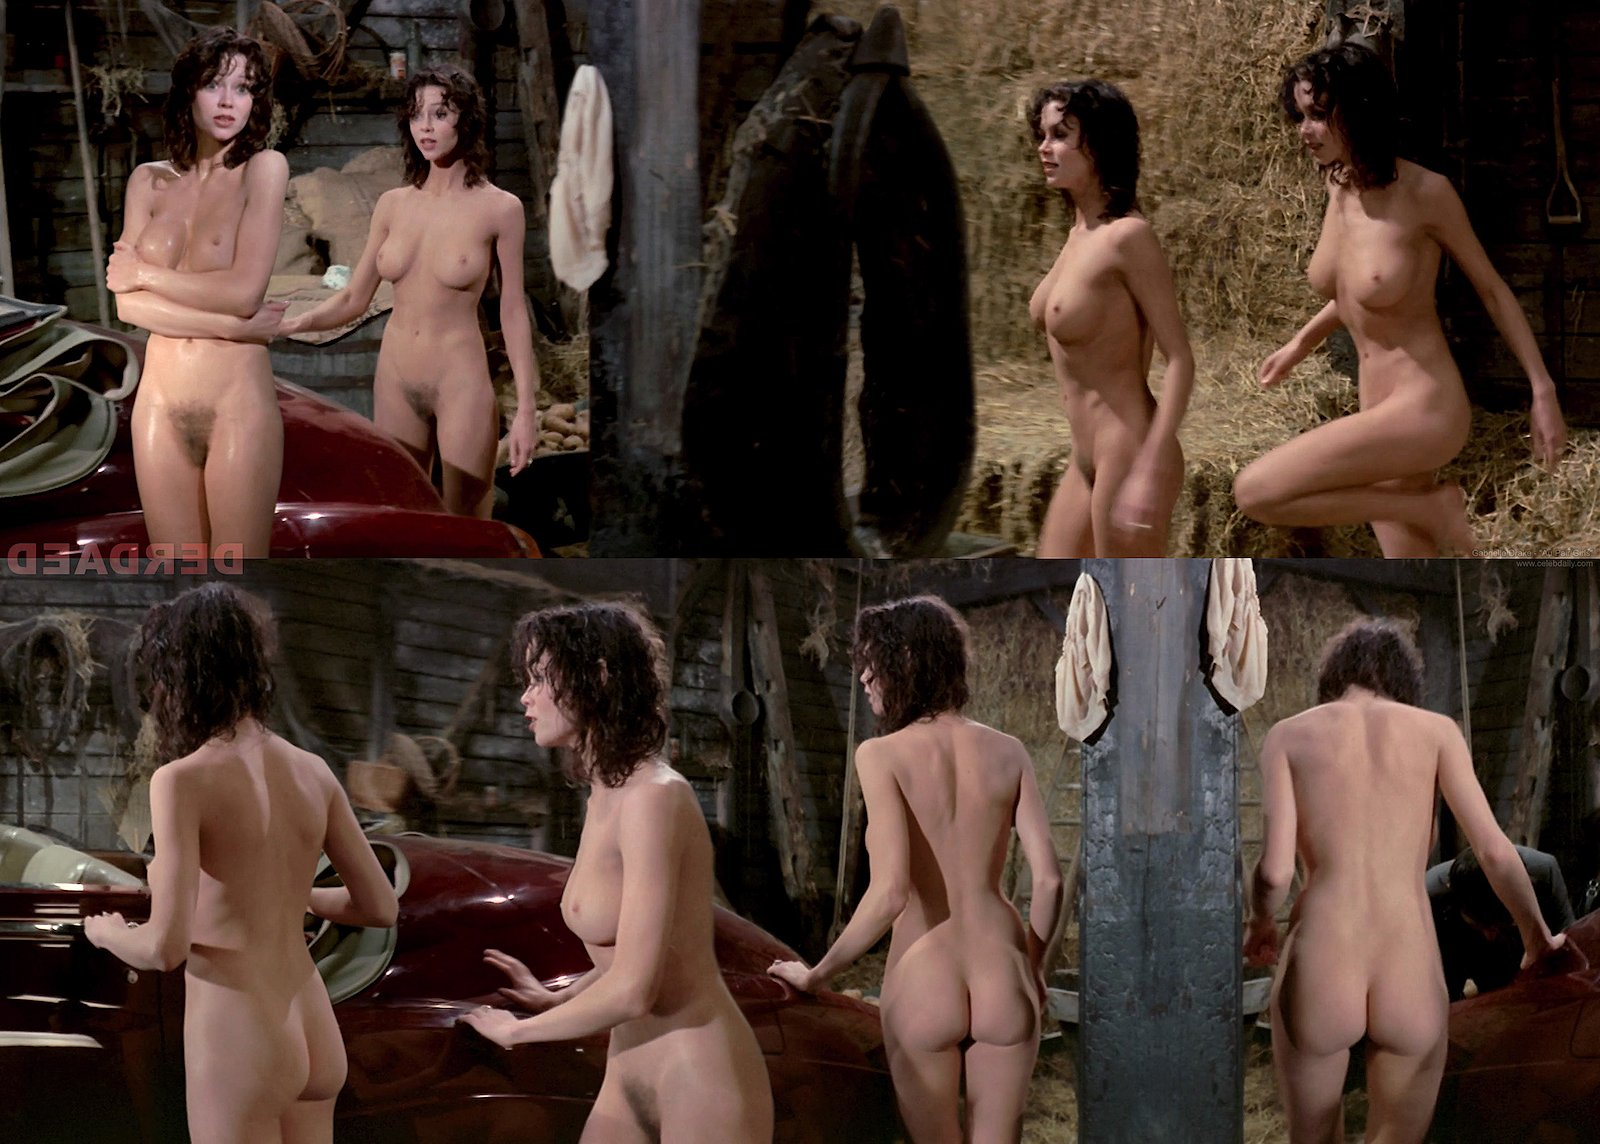 Nude celeb exploited movies